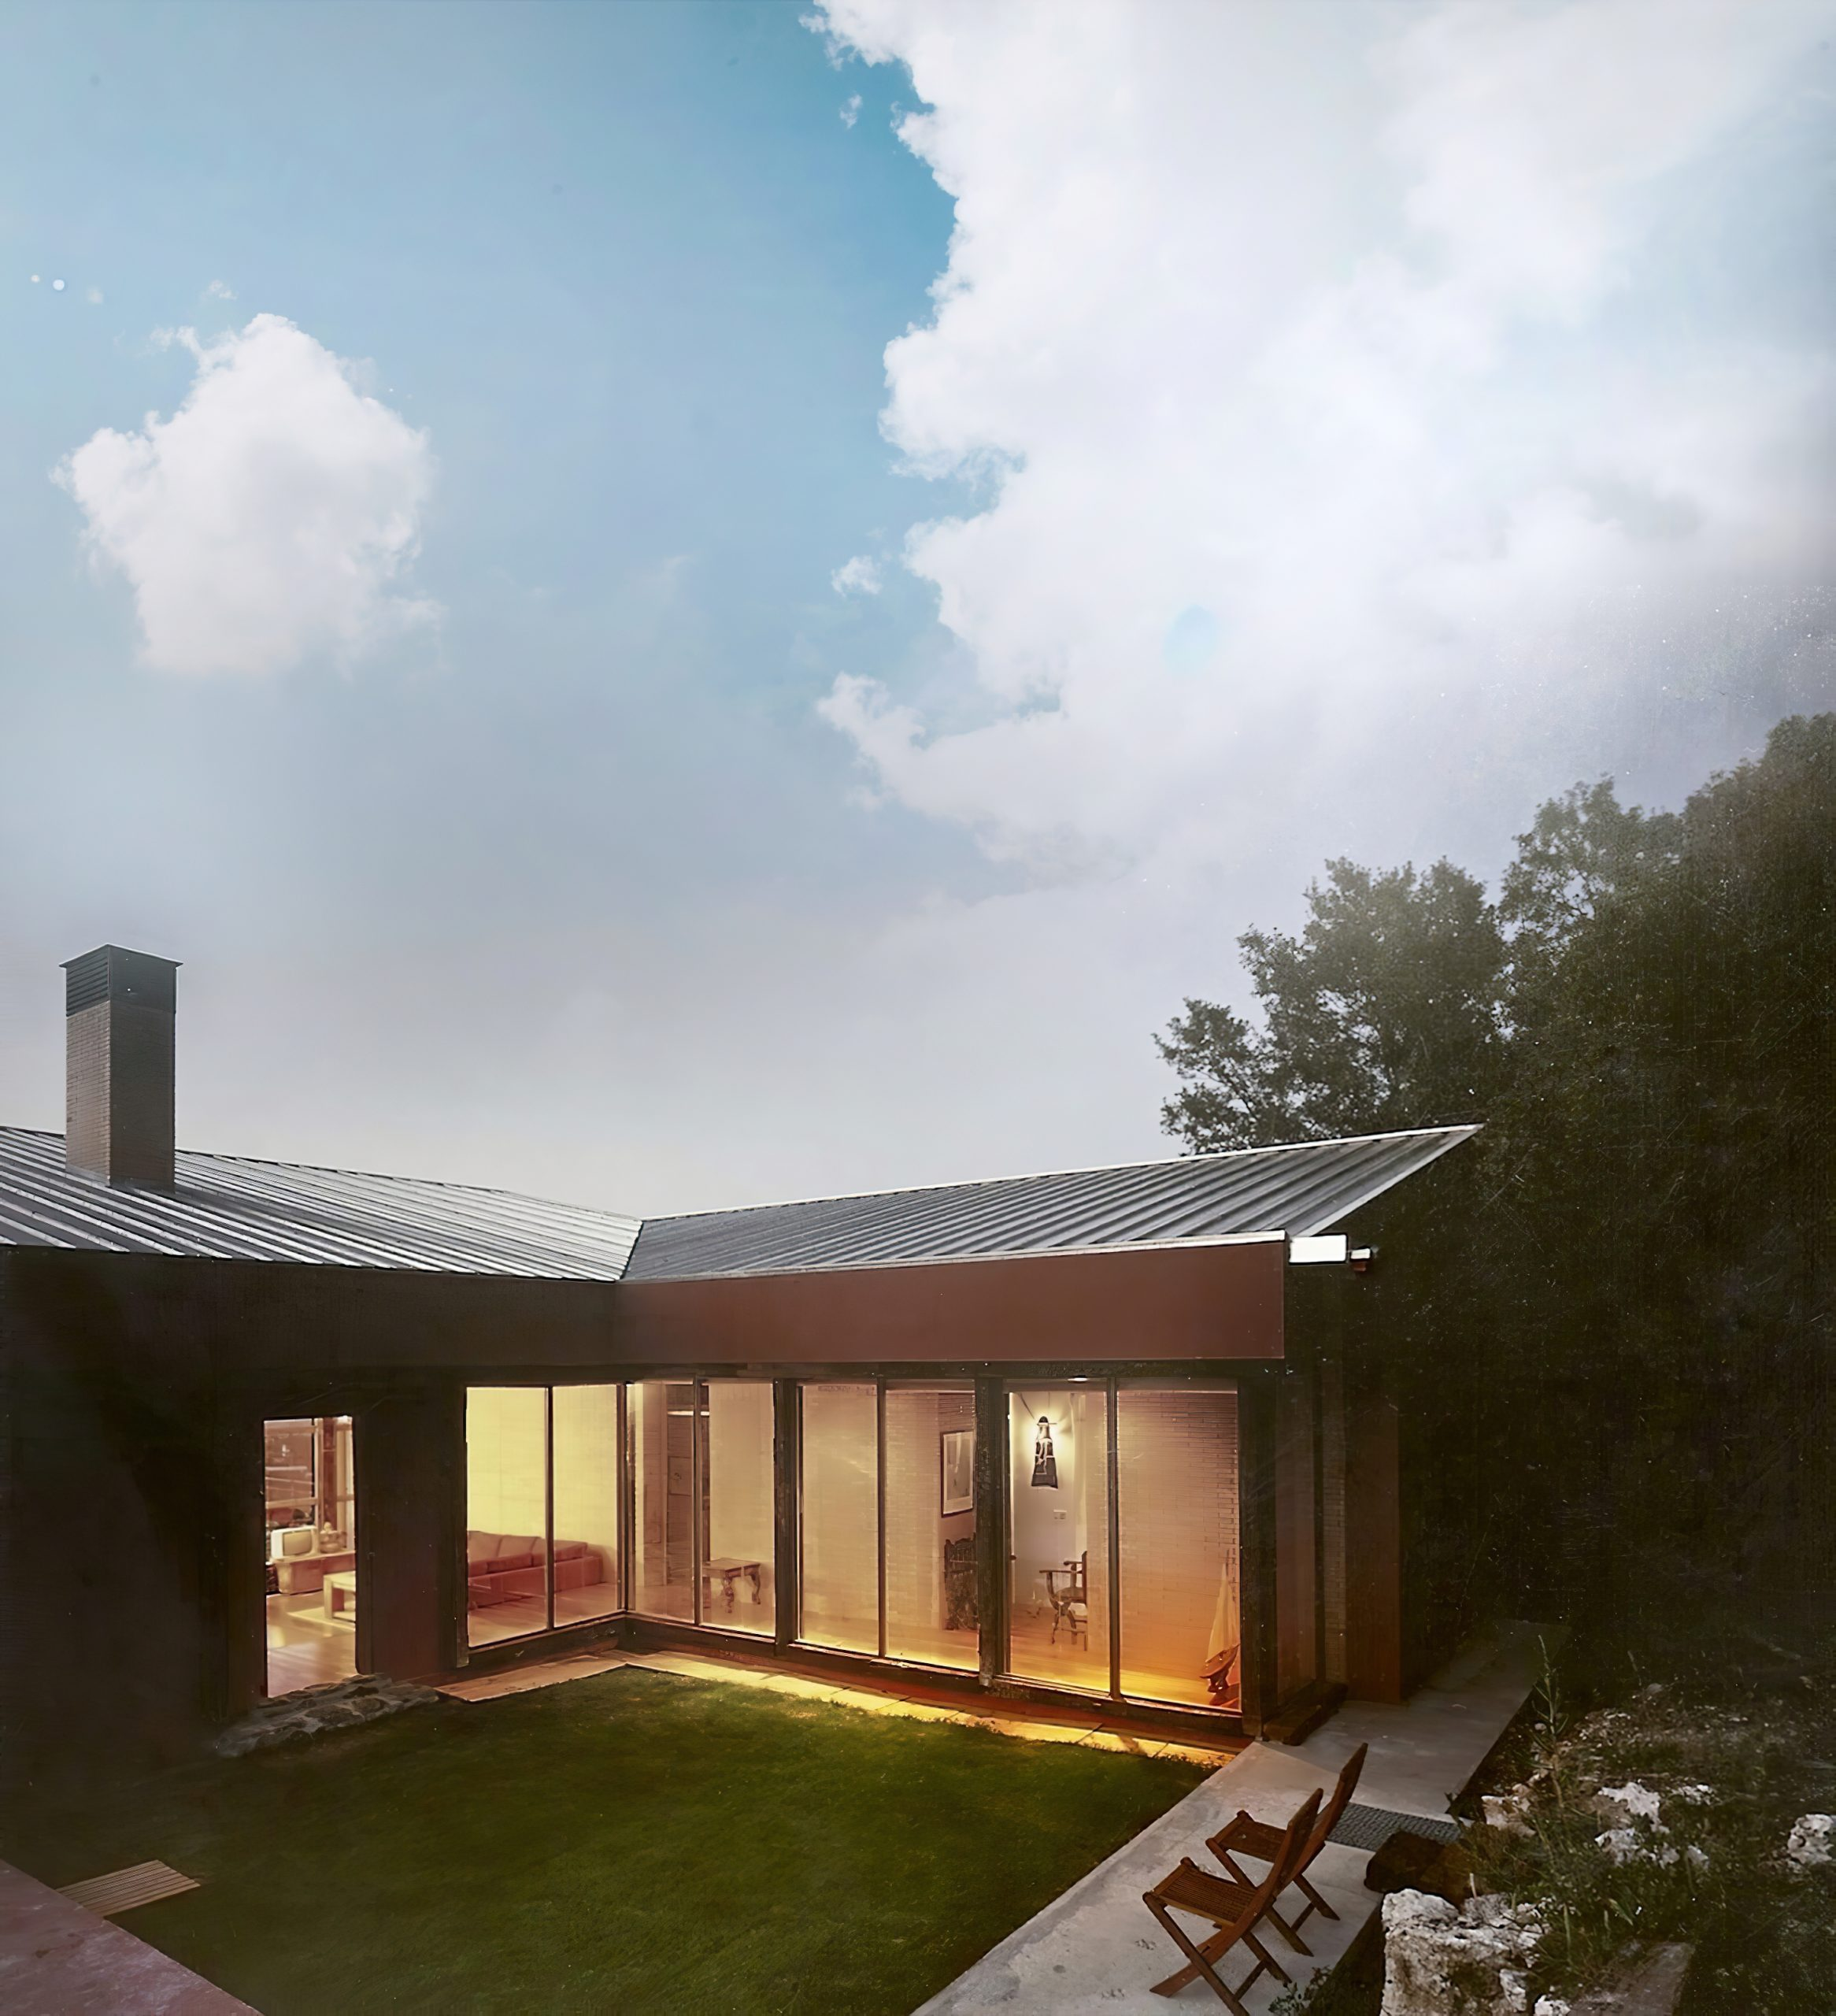 Casa Cotos ATGestion estudio arquitectura Perfect Pixel Publicidad 4 (2)